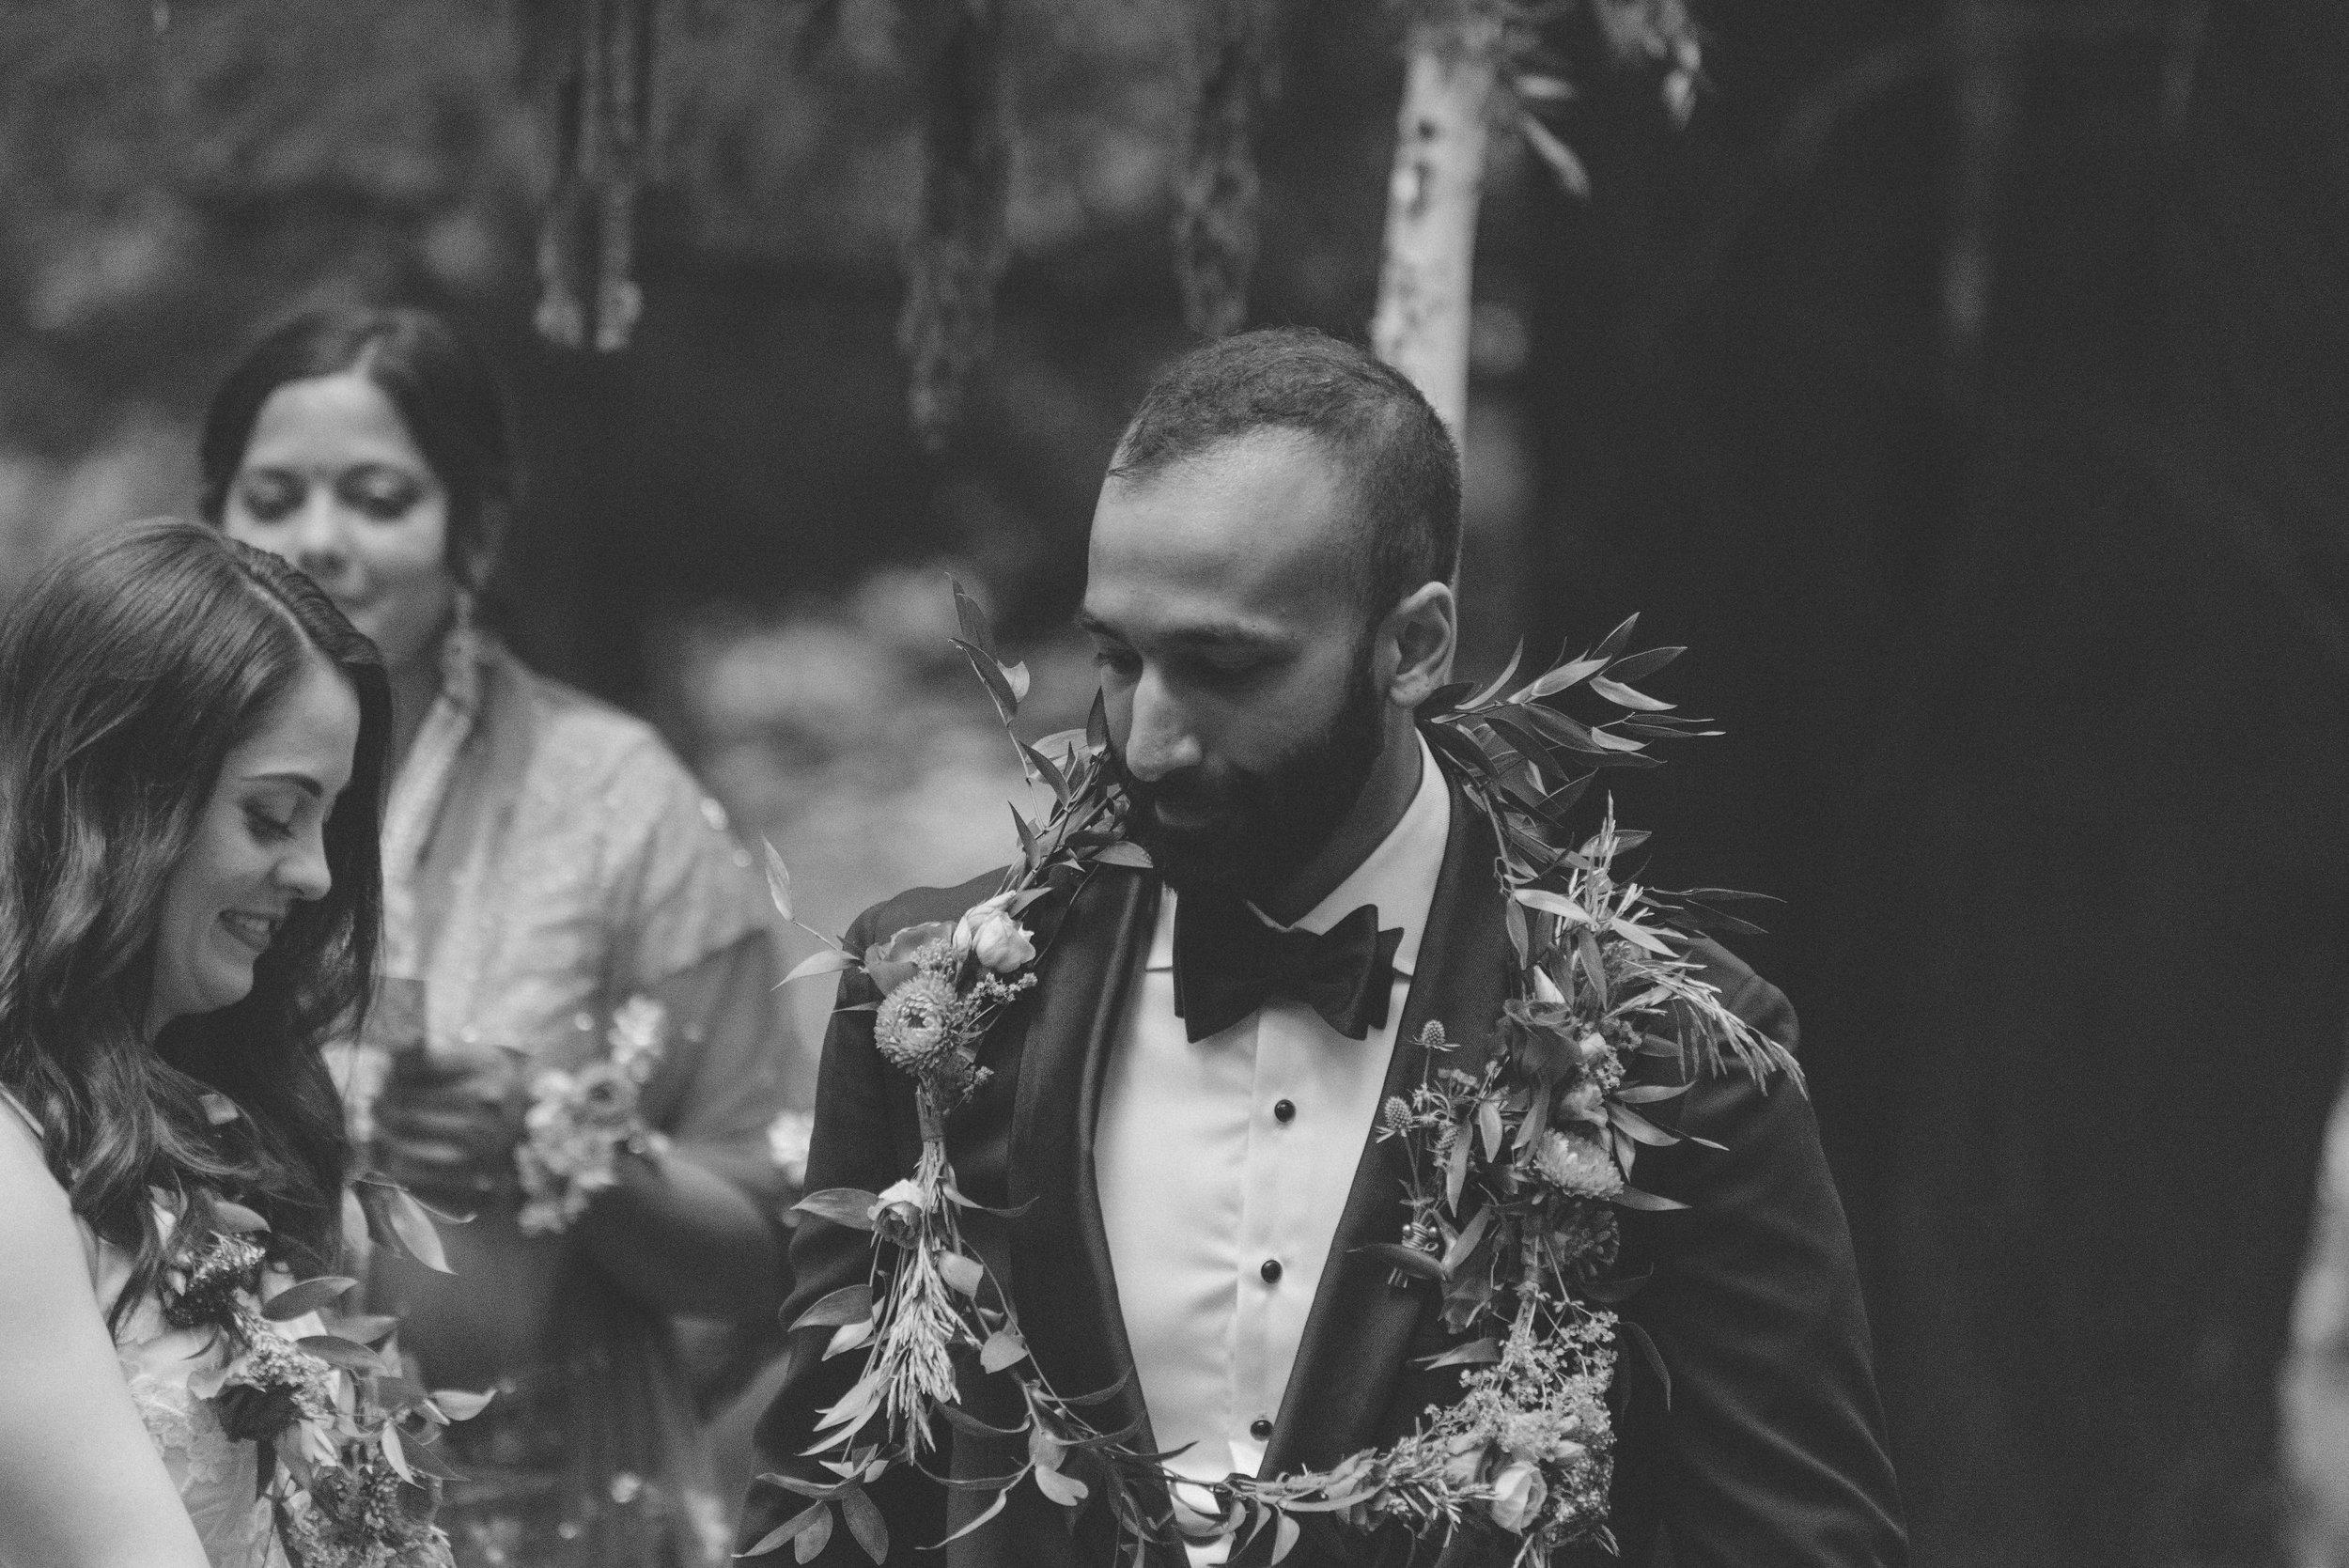 Cassandra-Anu-Wedding-Upstate-Catskills-Summer-Meadowlark-Stills-Lawrence-Braun-FINAL-0447.jpg